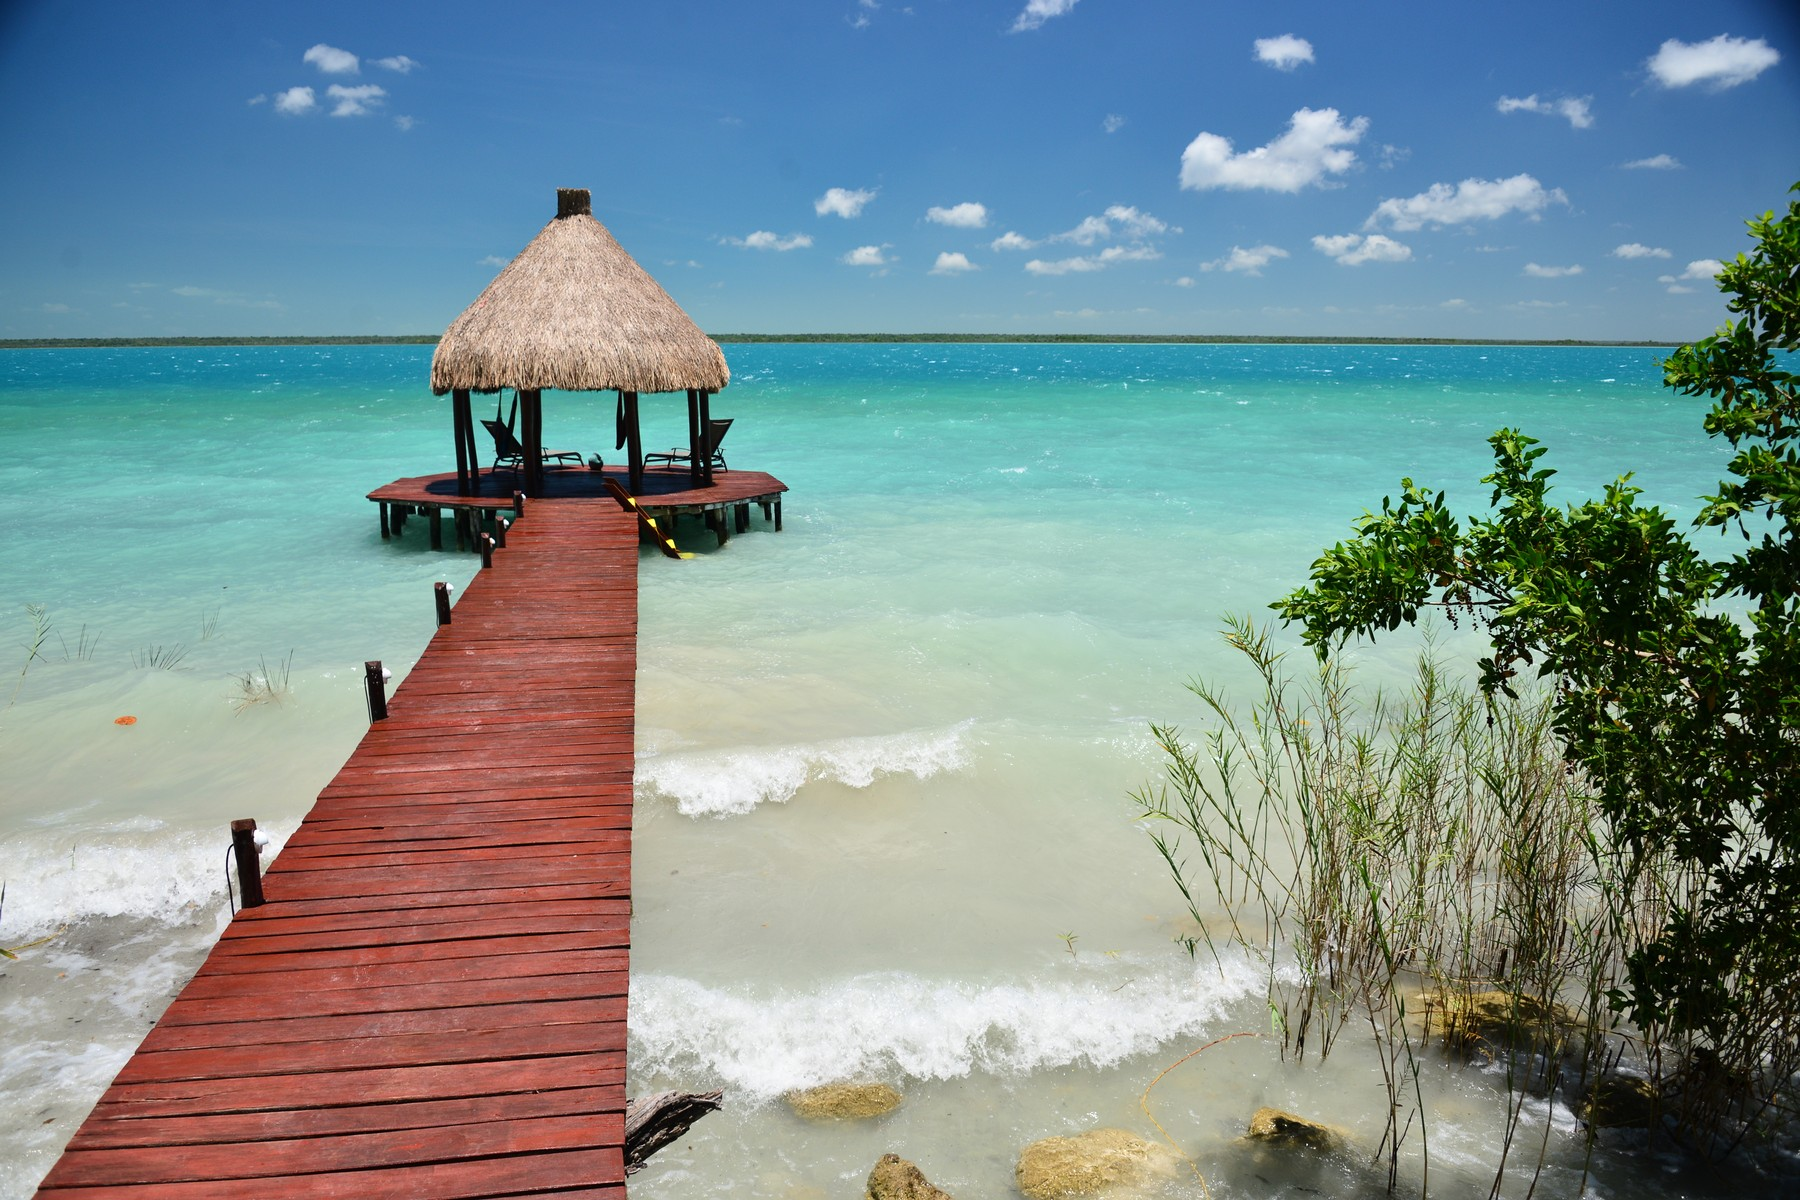 Proprietà in vendita Other Quintana Roo